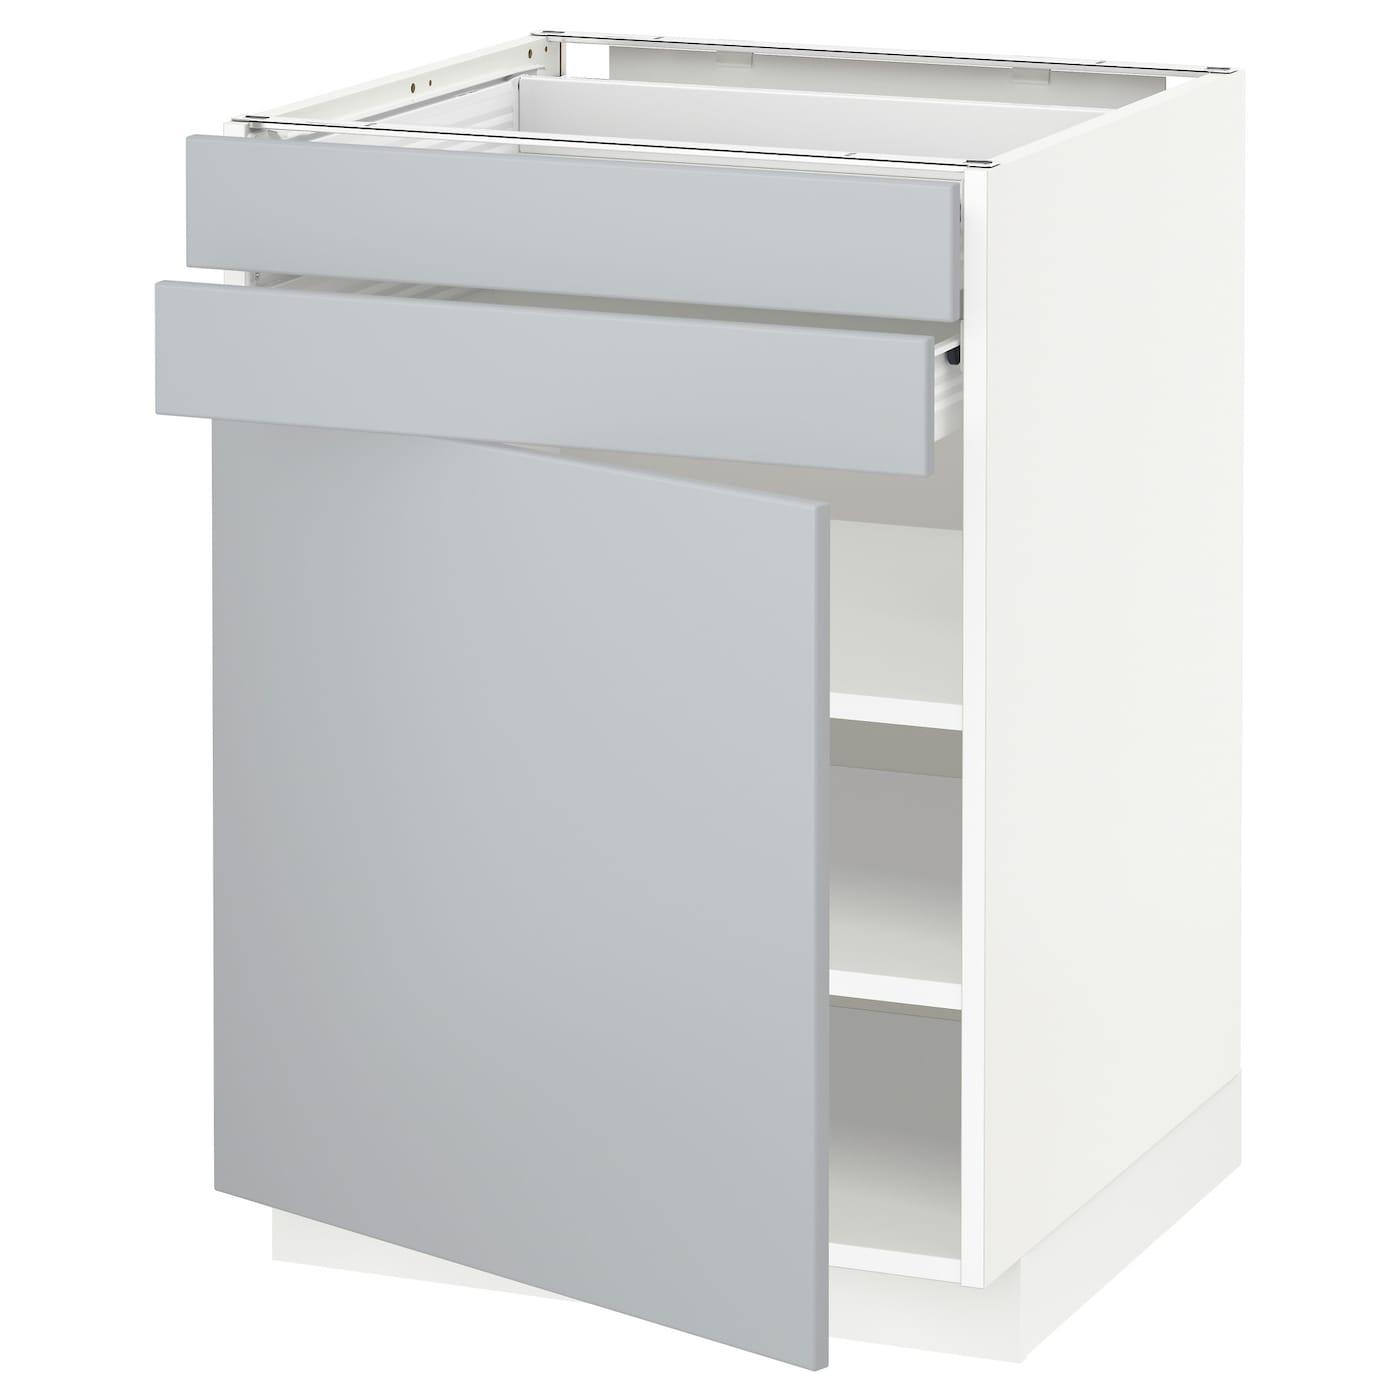 Ikea Kitchen Veddinge White: METOD/FÖRVARA Base Cabinet W Door/2 Drawers White/veddinge